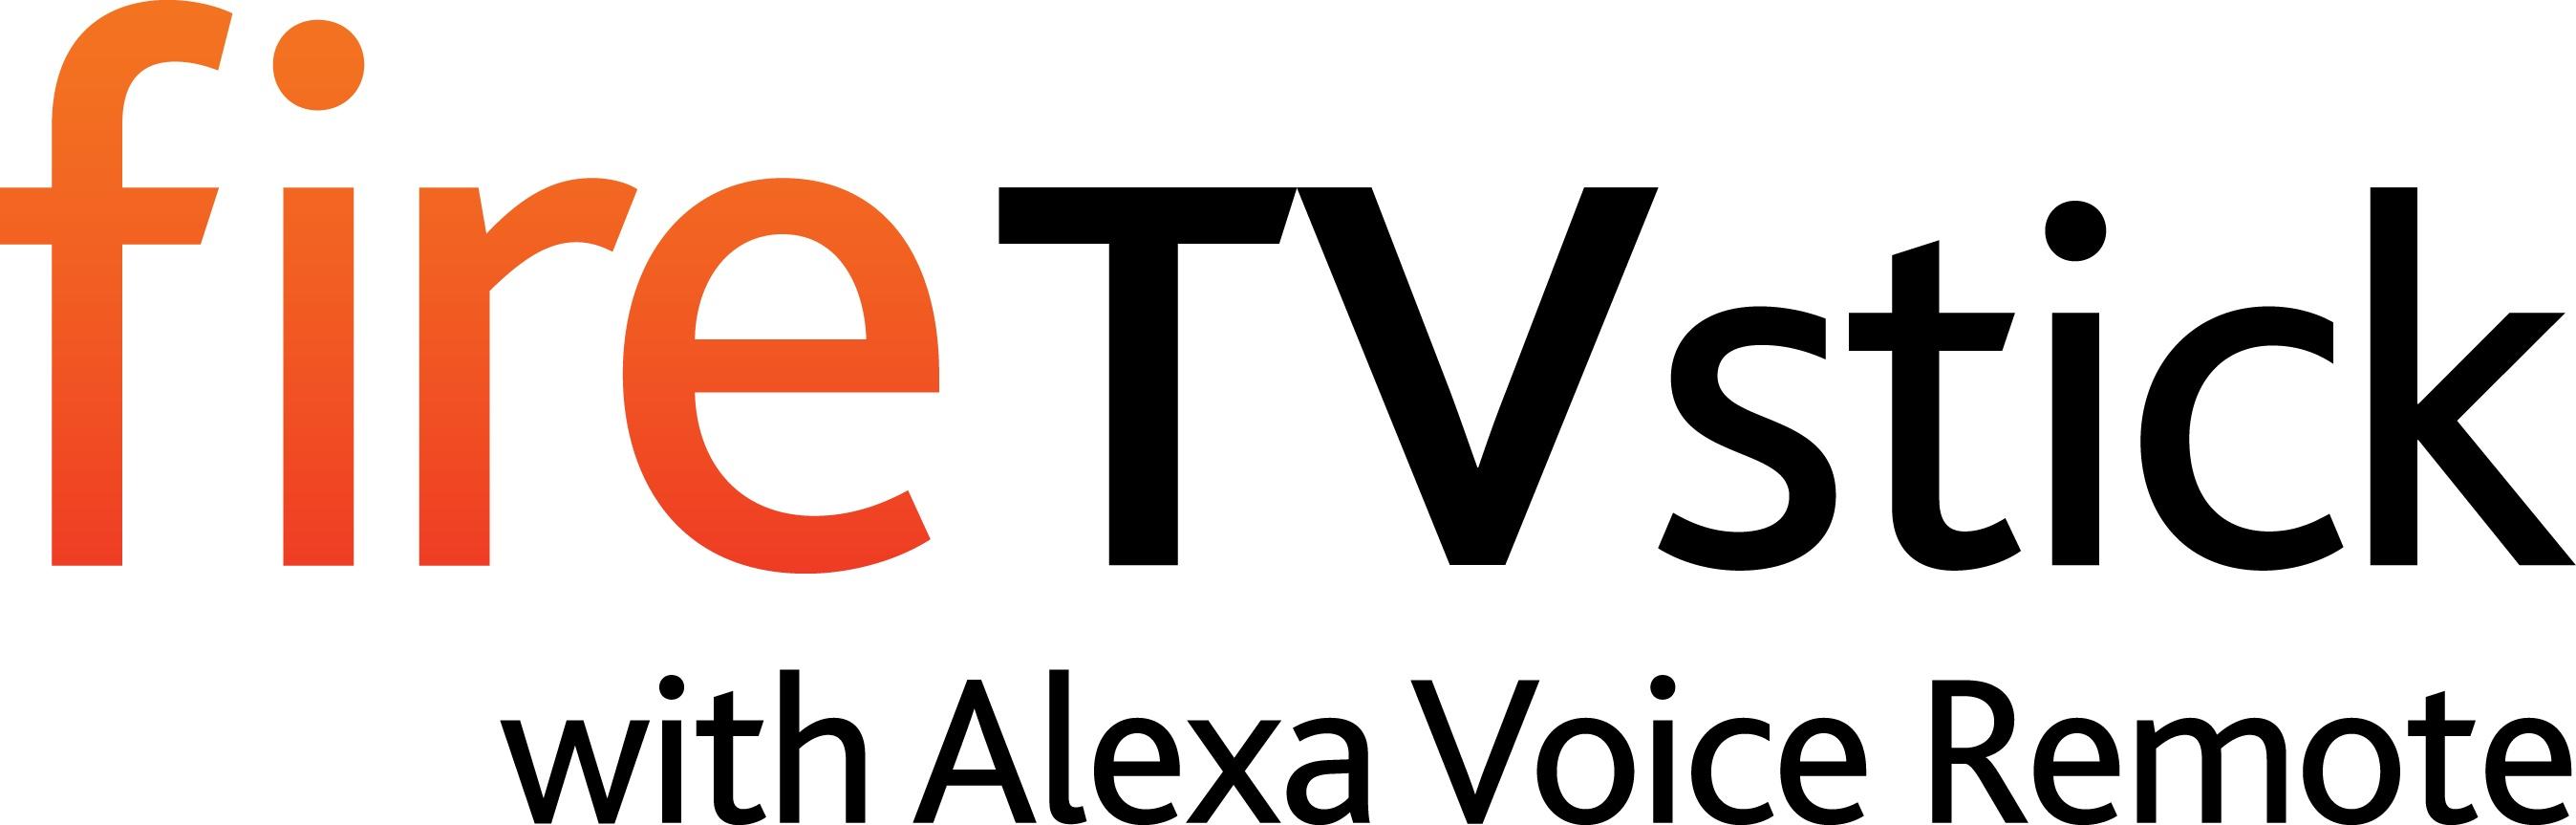 2696x863 Amazon Alexa Logo Vector Png Transparent Amazon Alexa Logo Vector